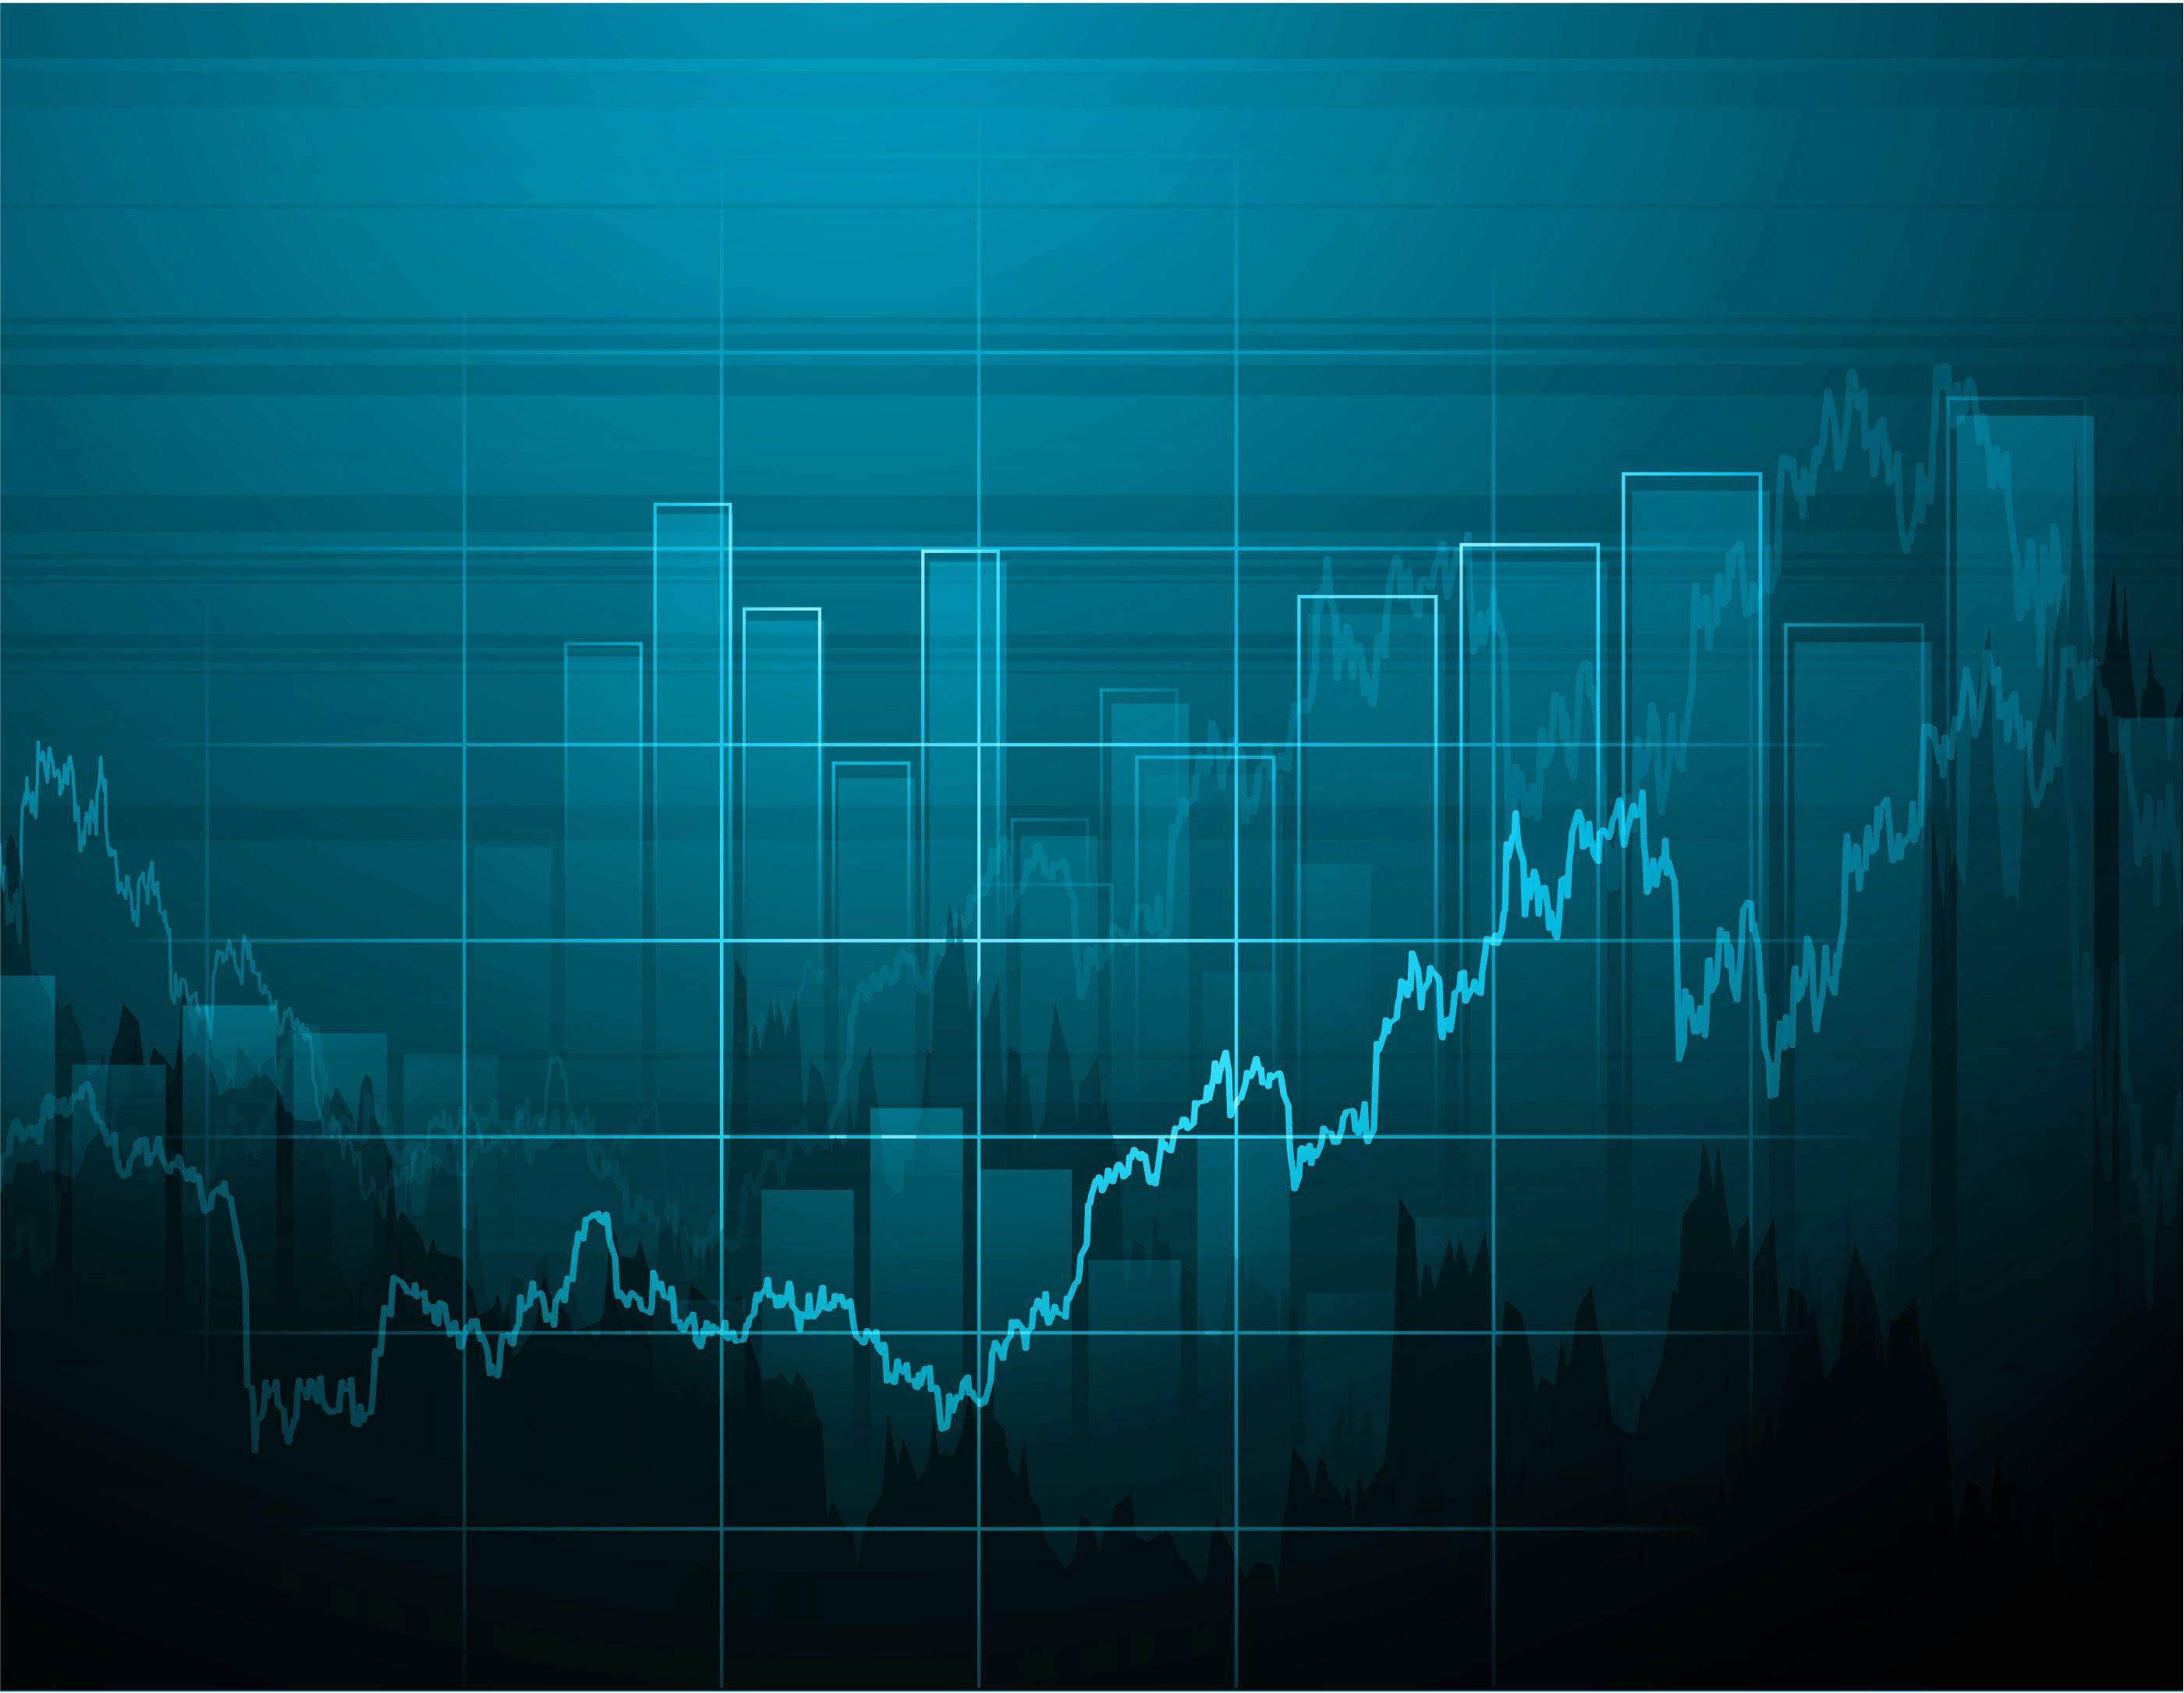 TradingView - Stocks & Forex on the App Store